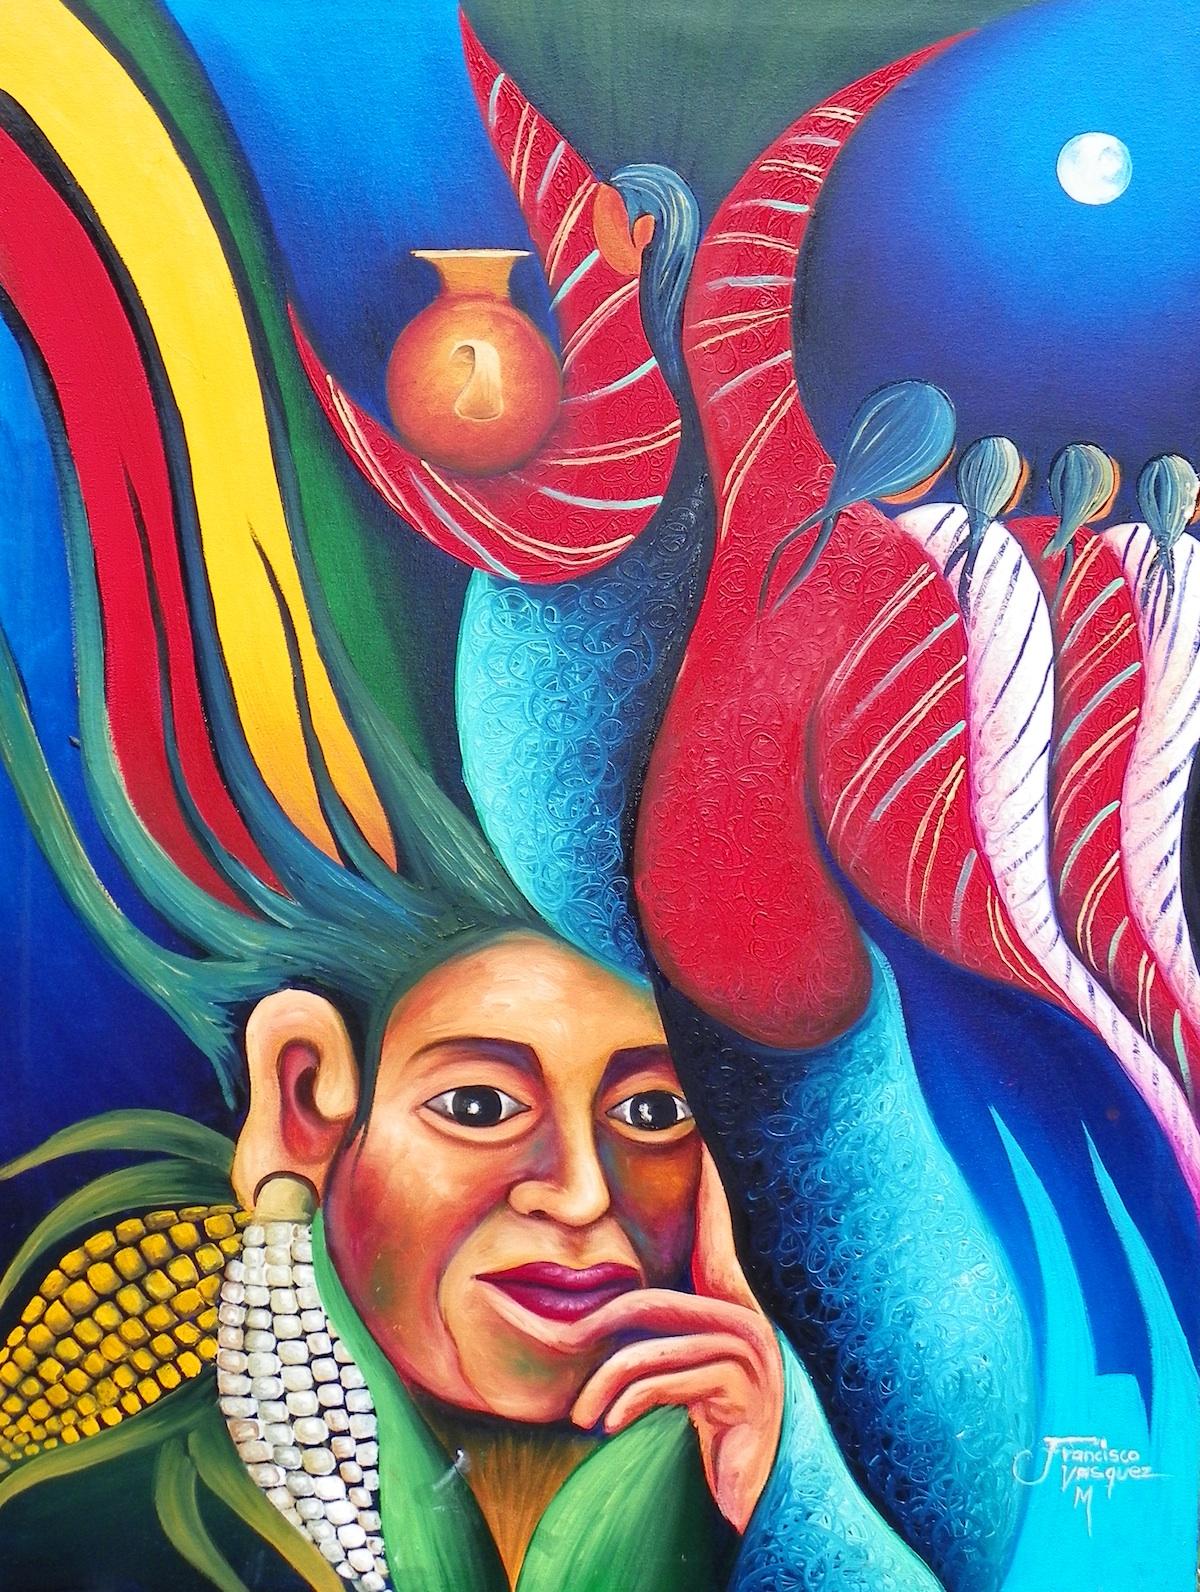 Lake Atitlan Painting Francisco Vásquez Mendoza